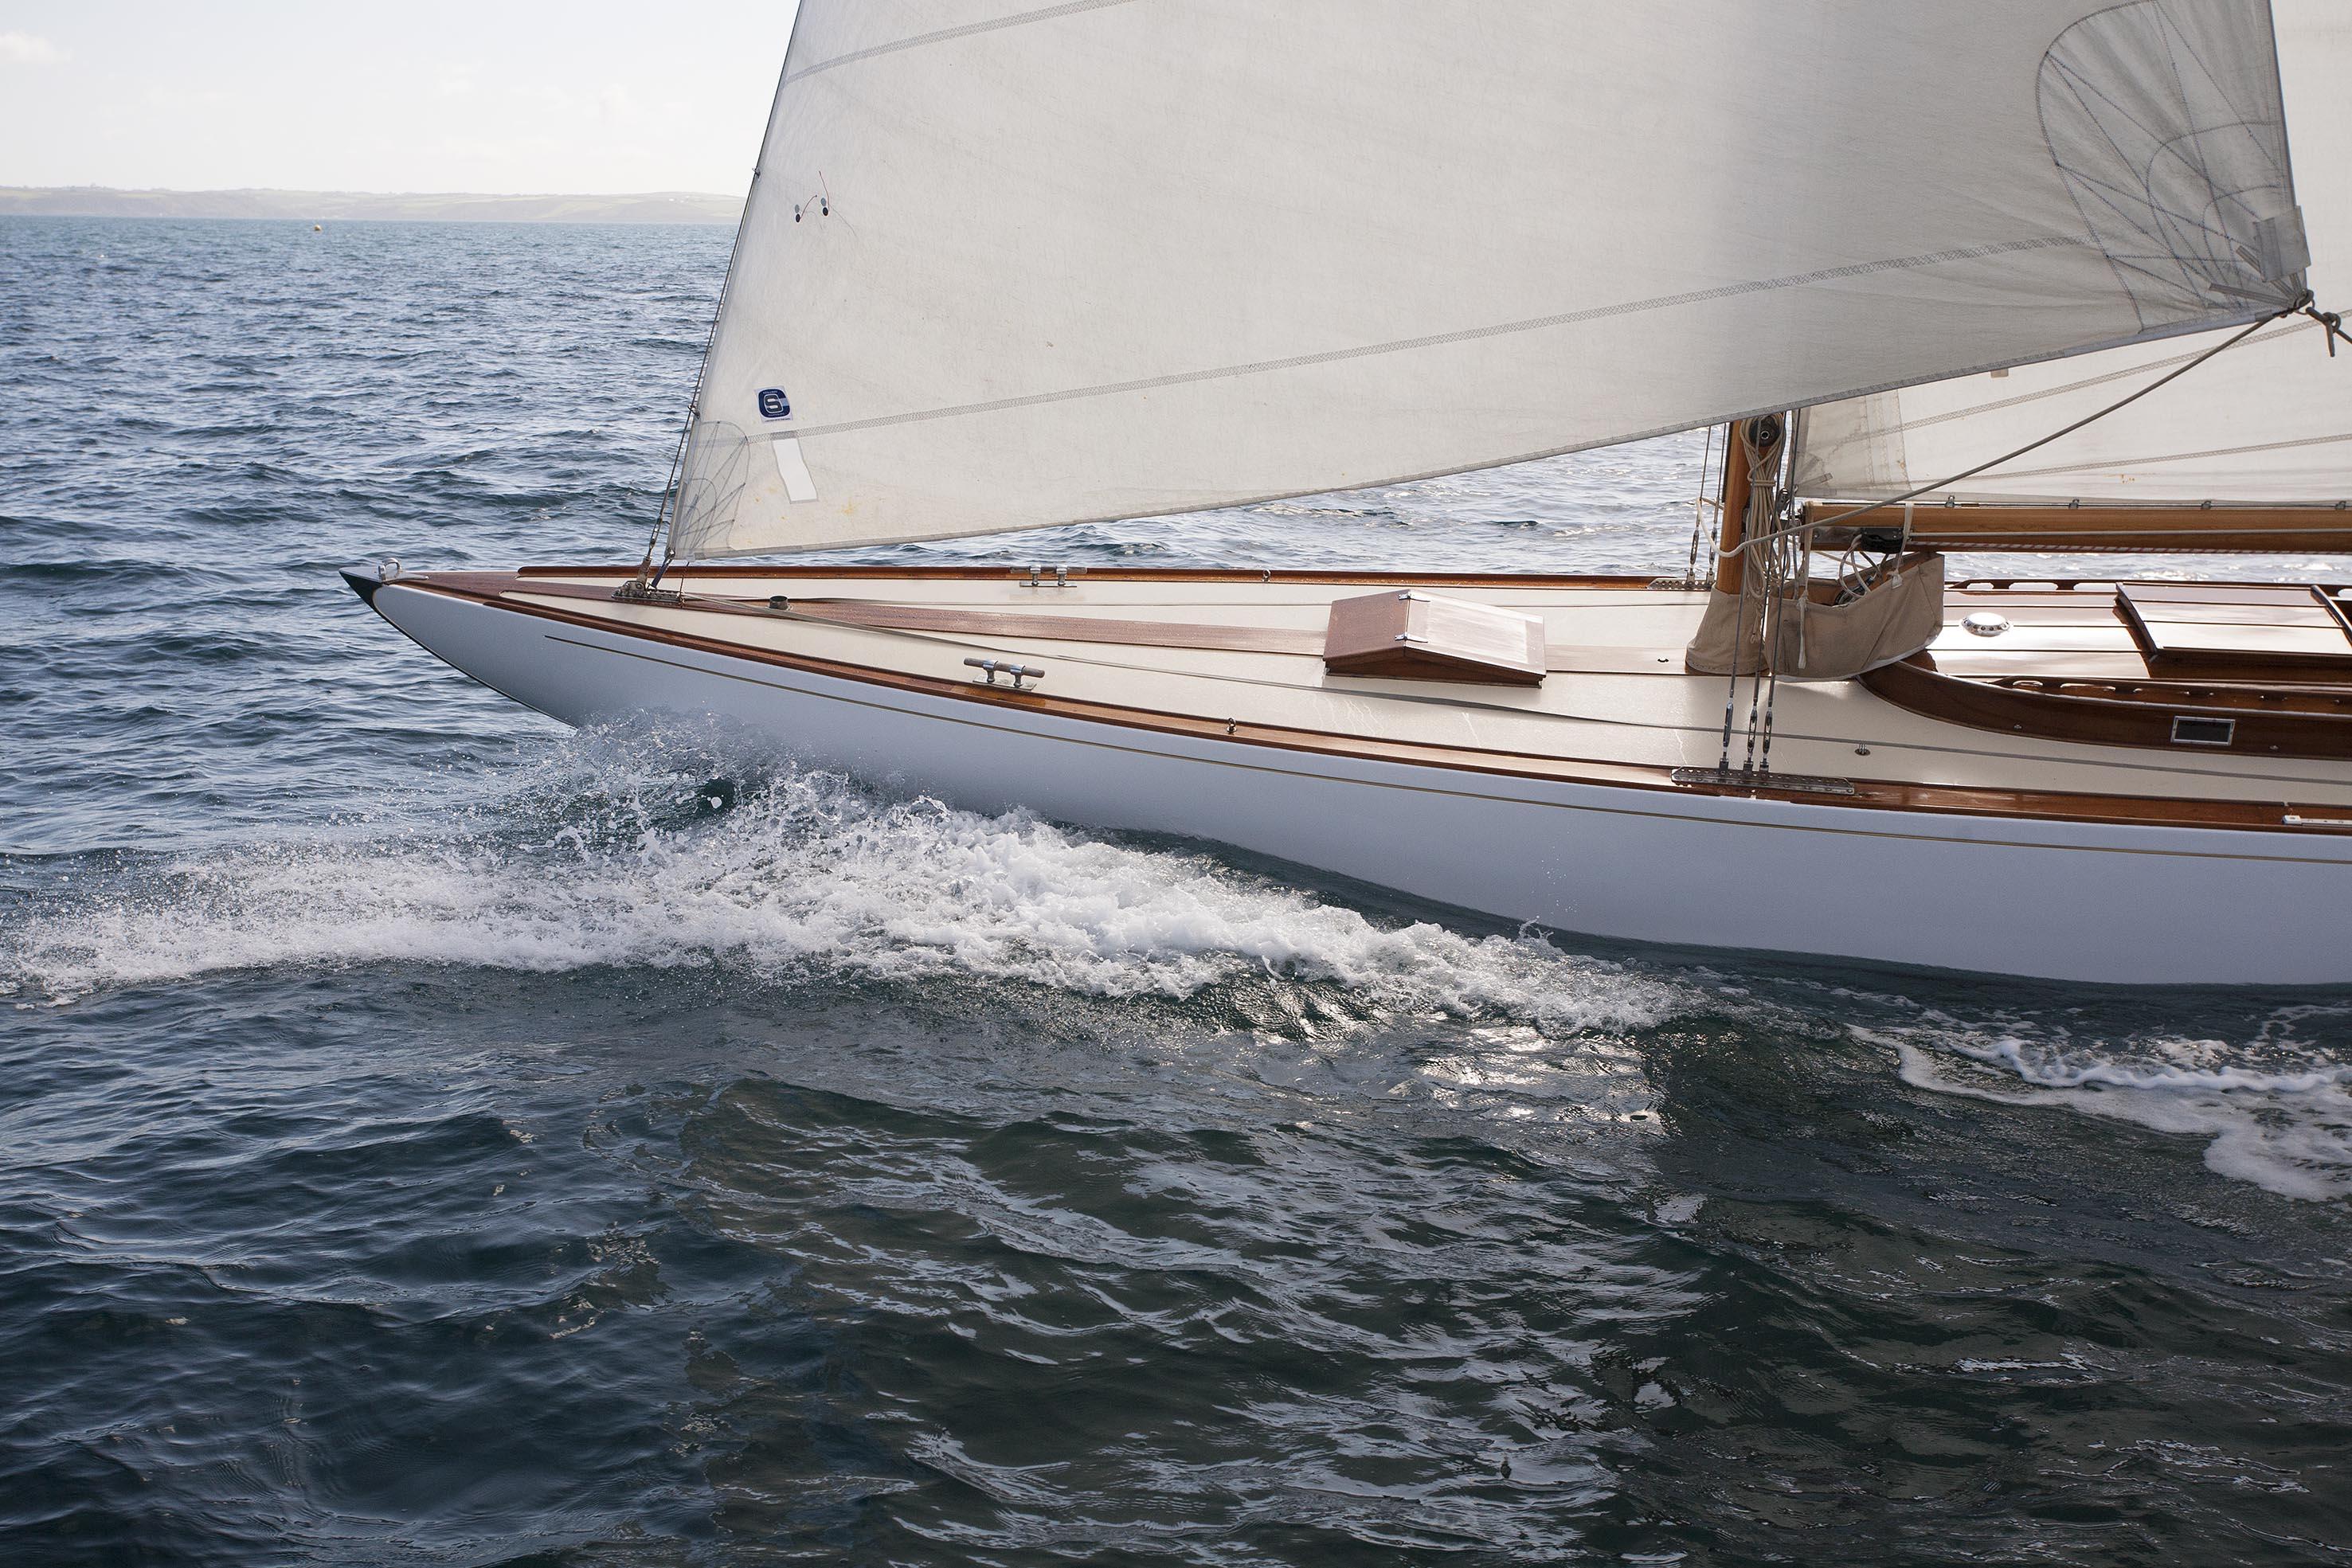 Boat finish